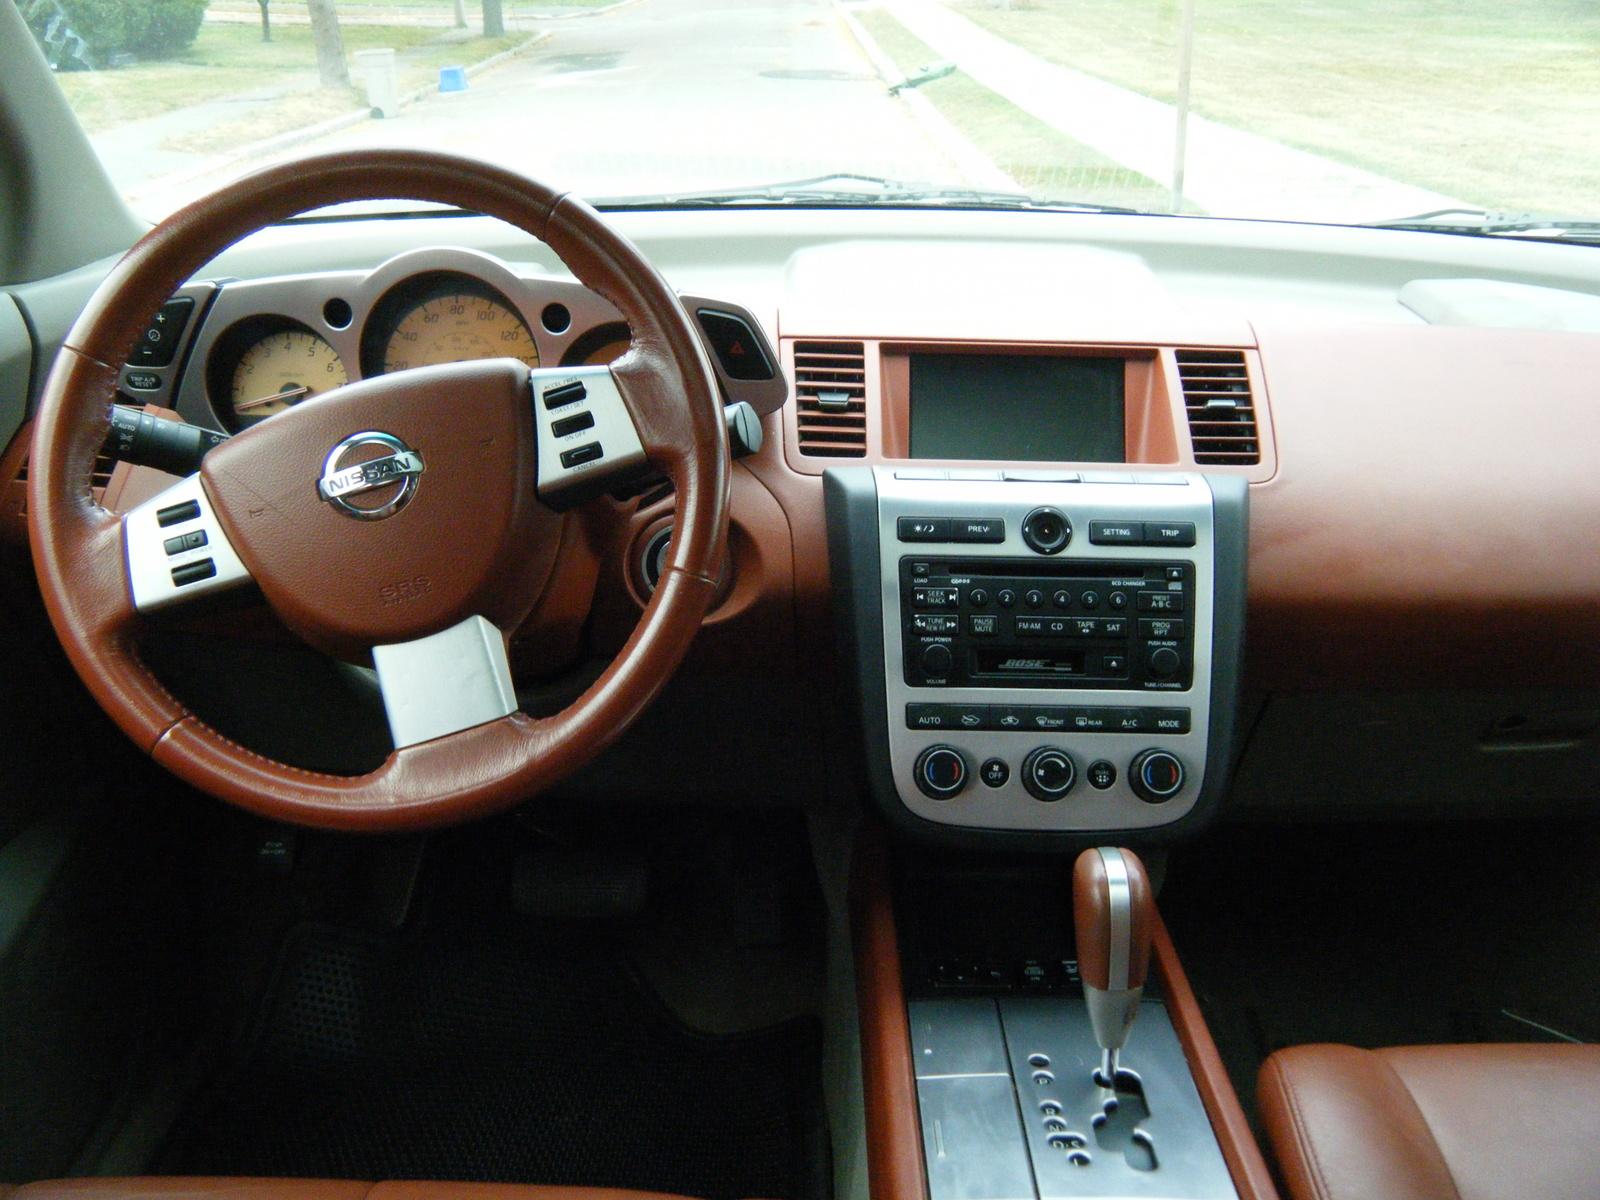 Nissan Dealership Wilmington Nc Upcomingcarshq Com